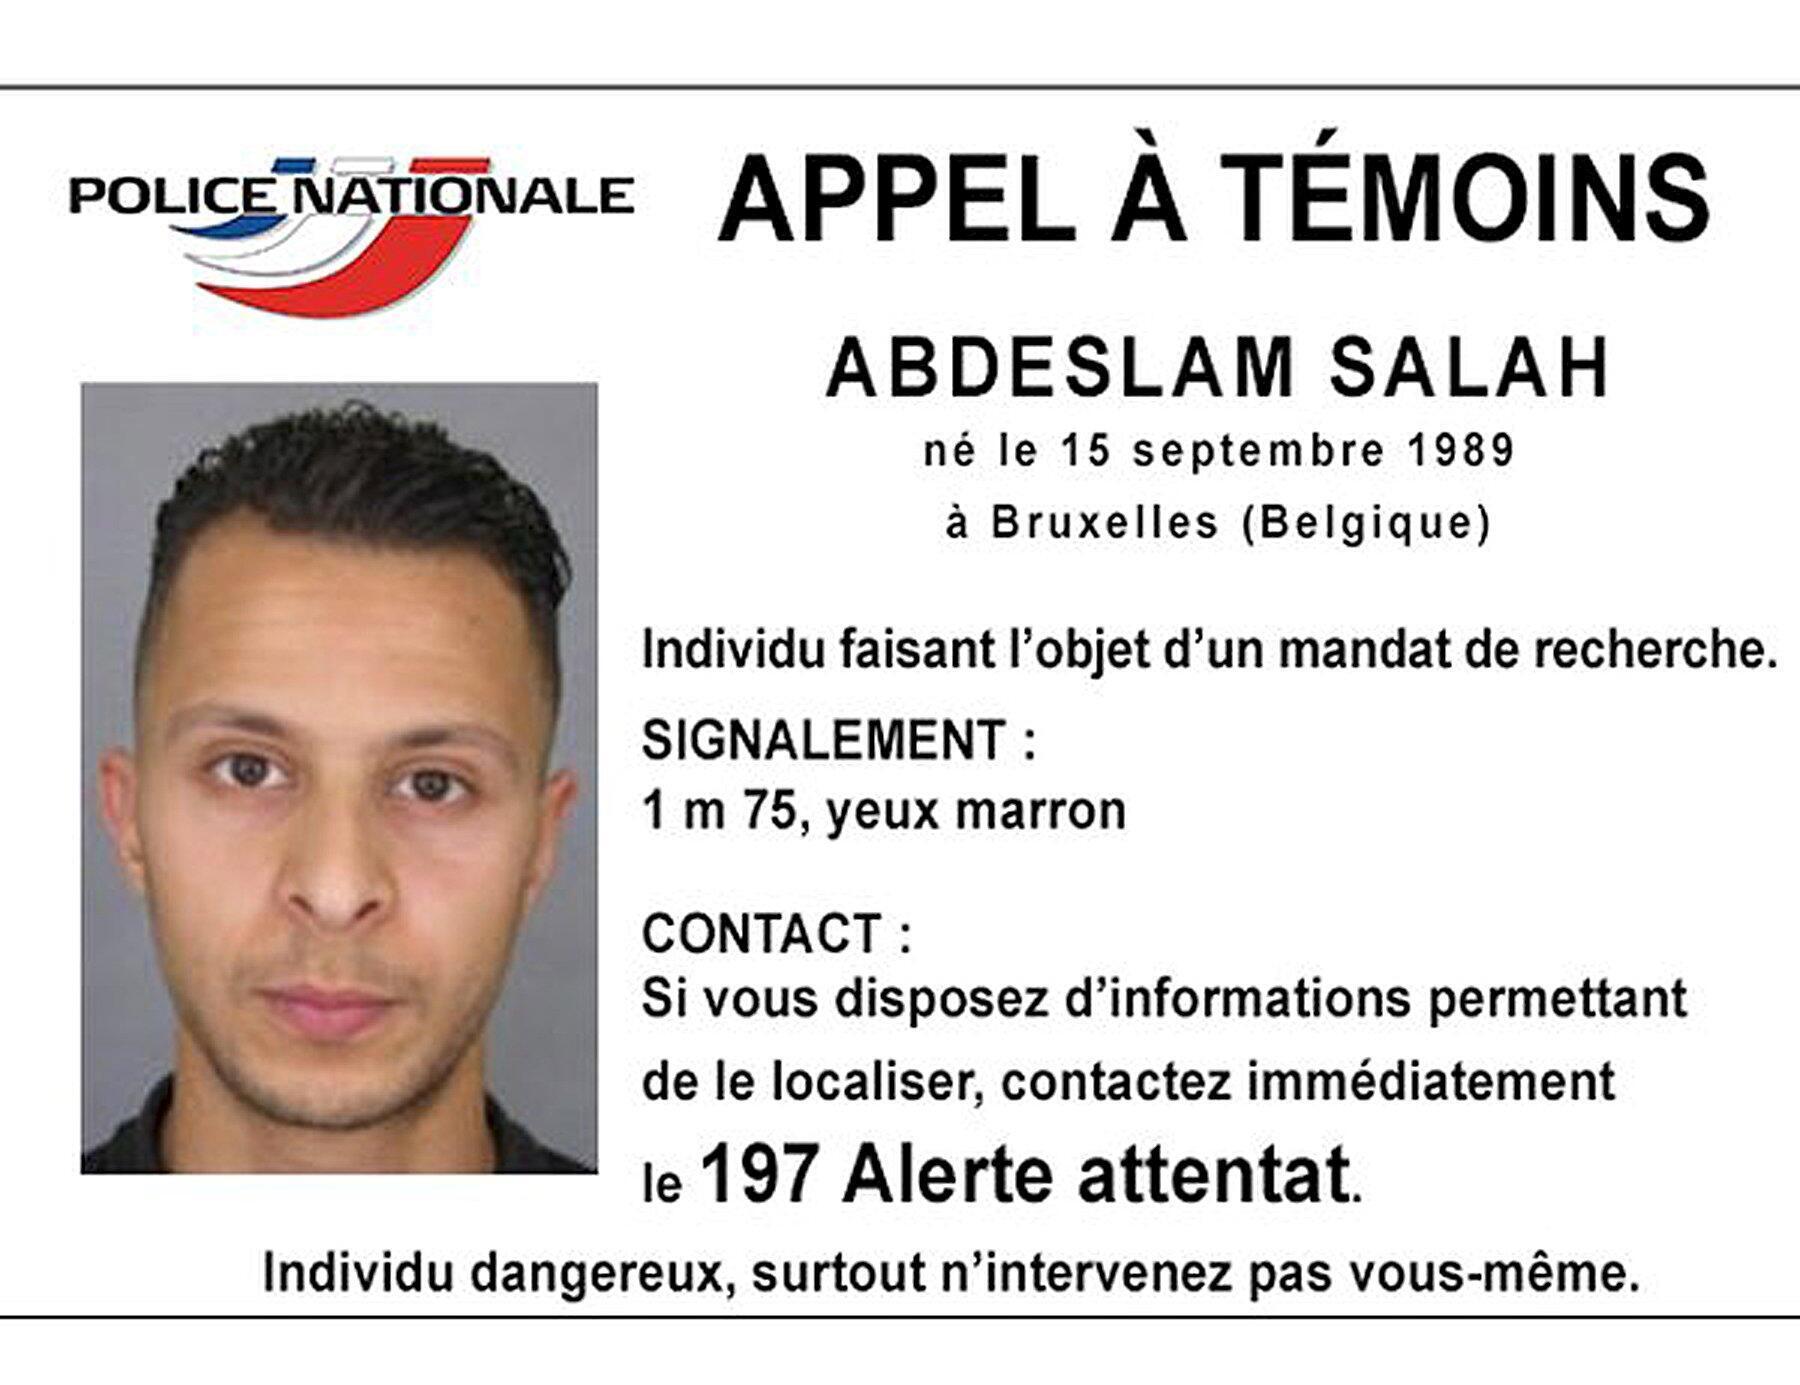 Mandado de busca internacional de Abdeslam Salah, belga de 26 anos.